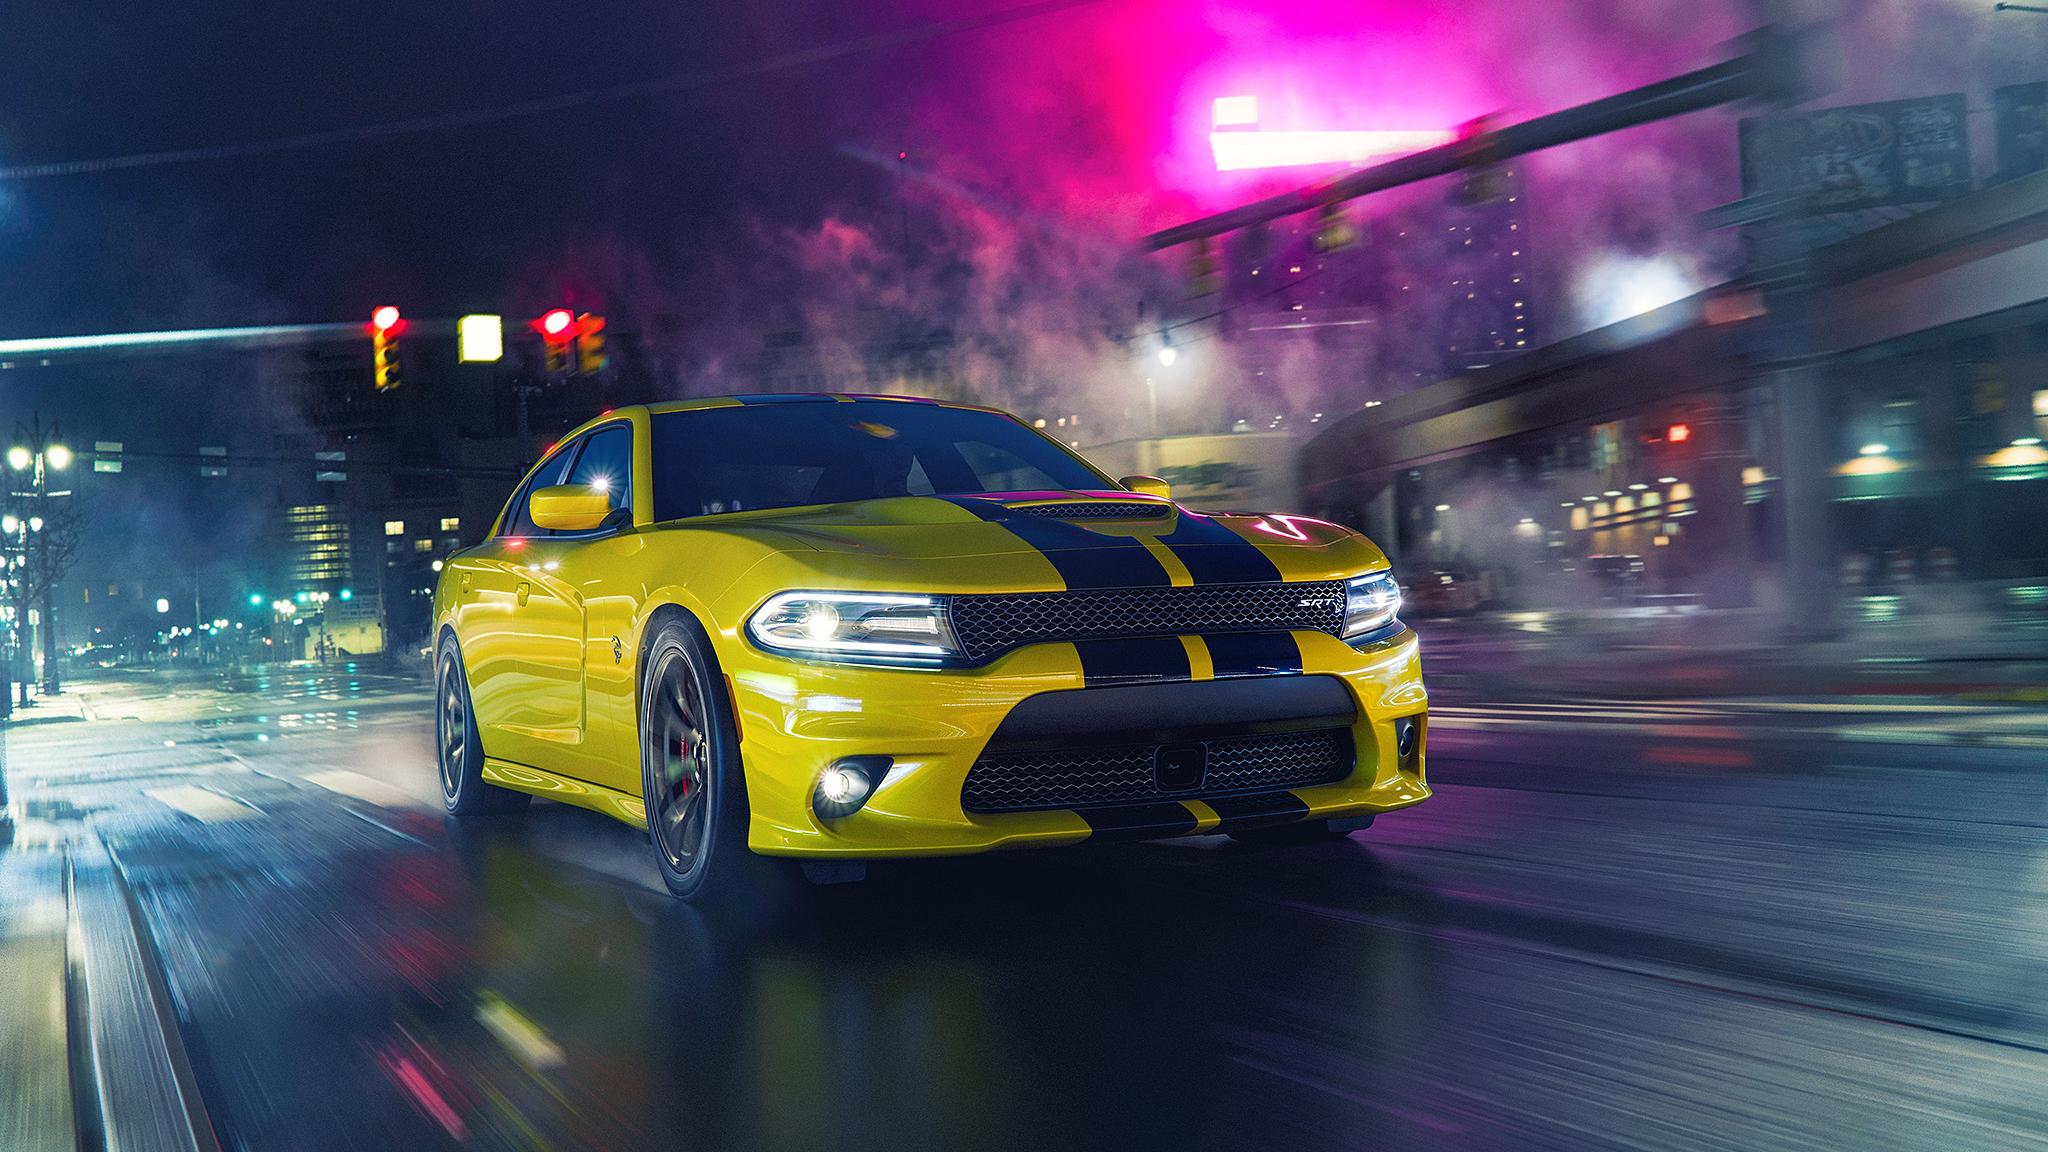 Dodge Charger Hellcat Wallpaper HD Car Wallpapers ID 10789 2048x1152